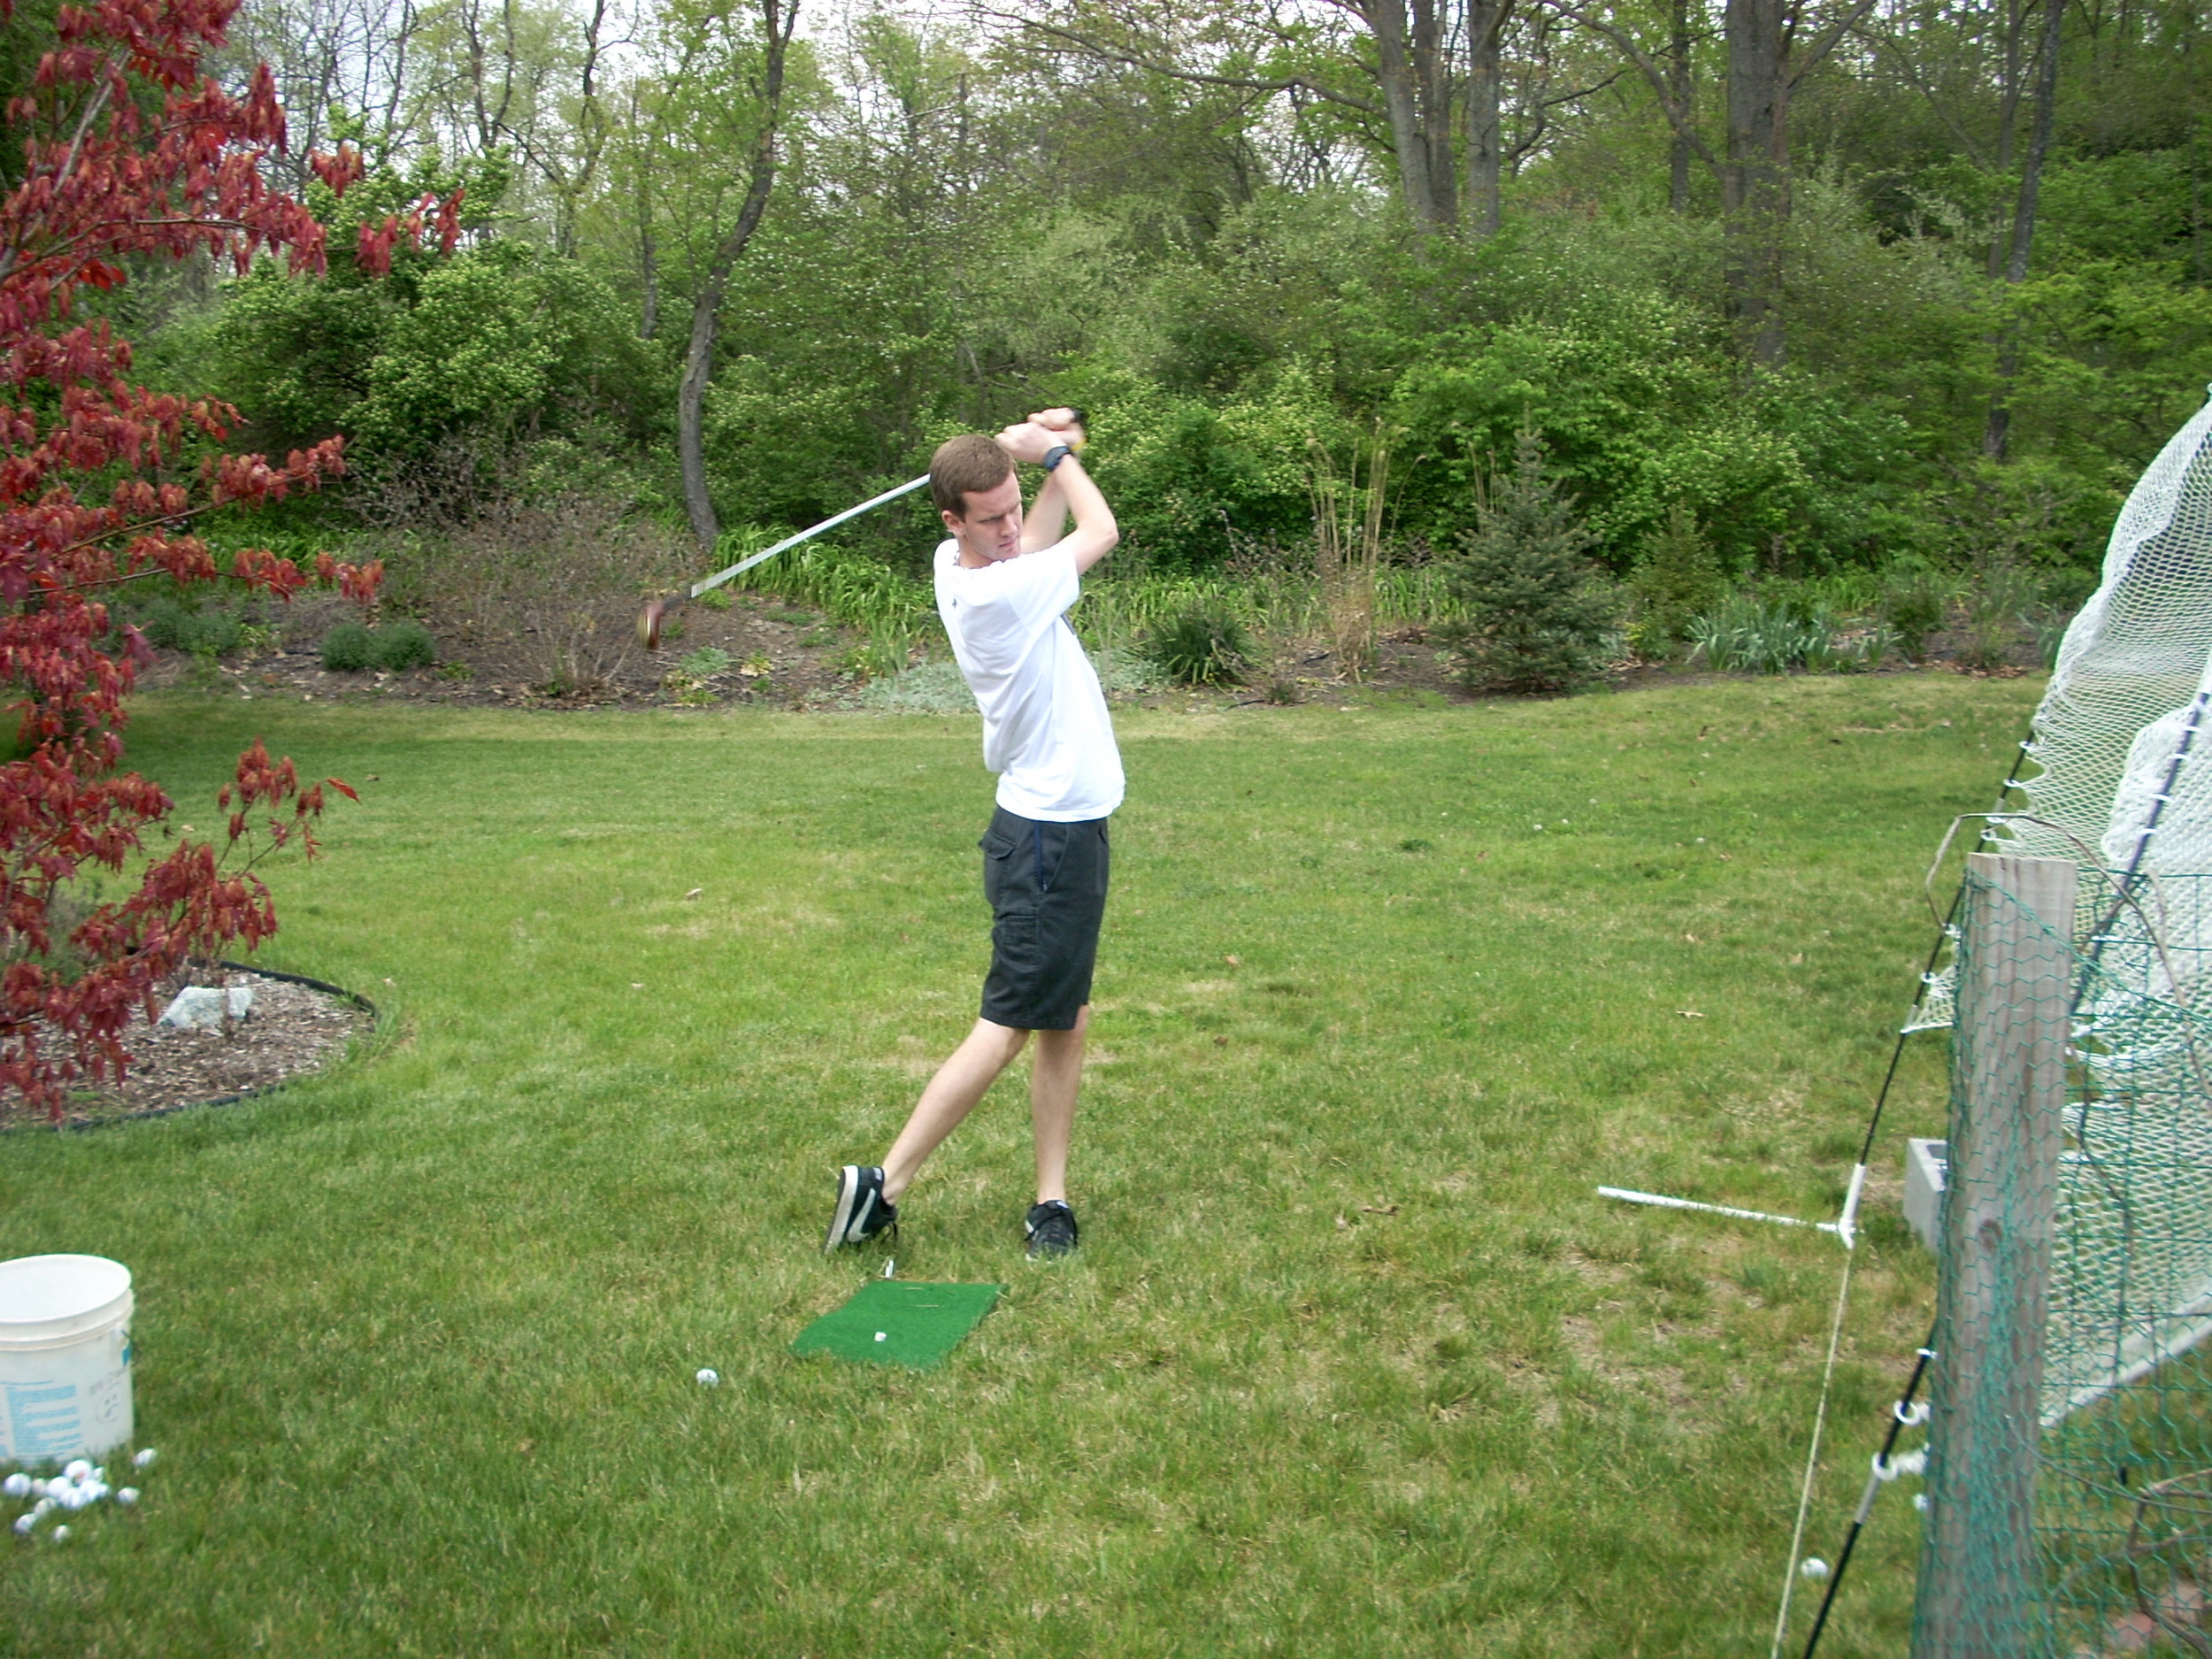 Playing some Golf 01.JPG